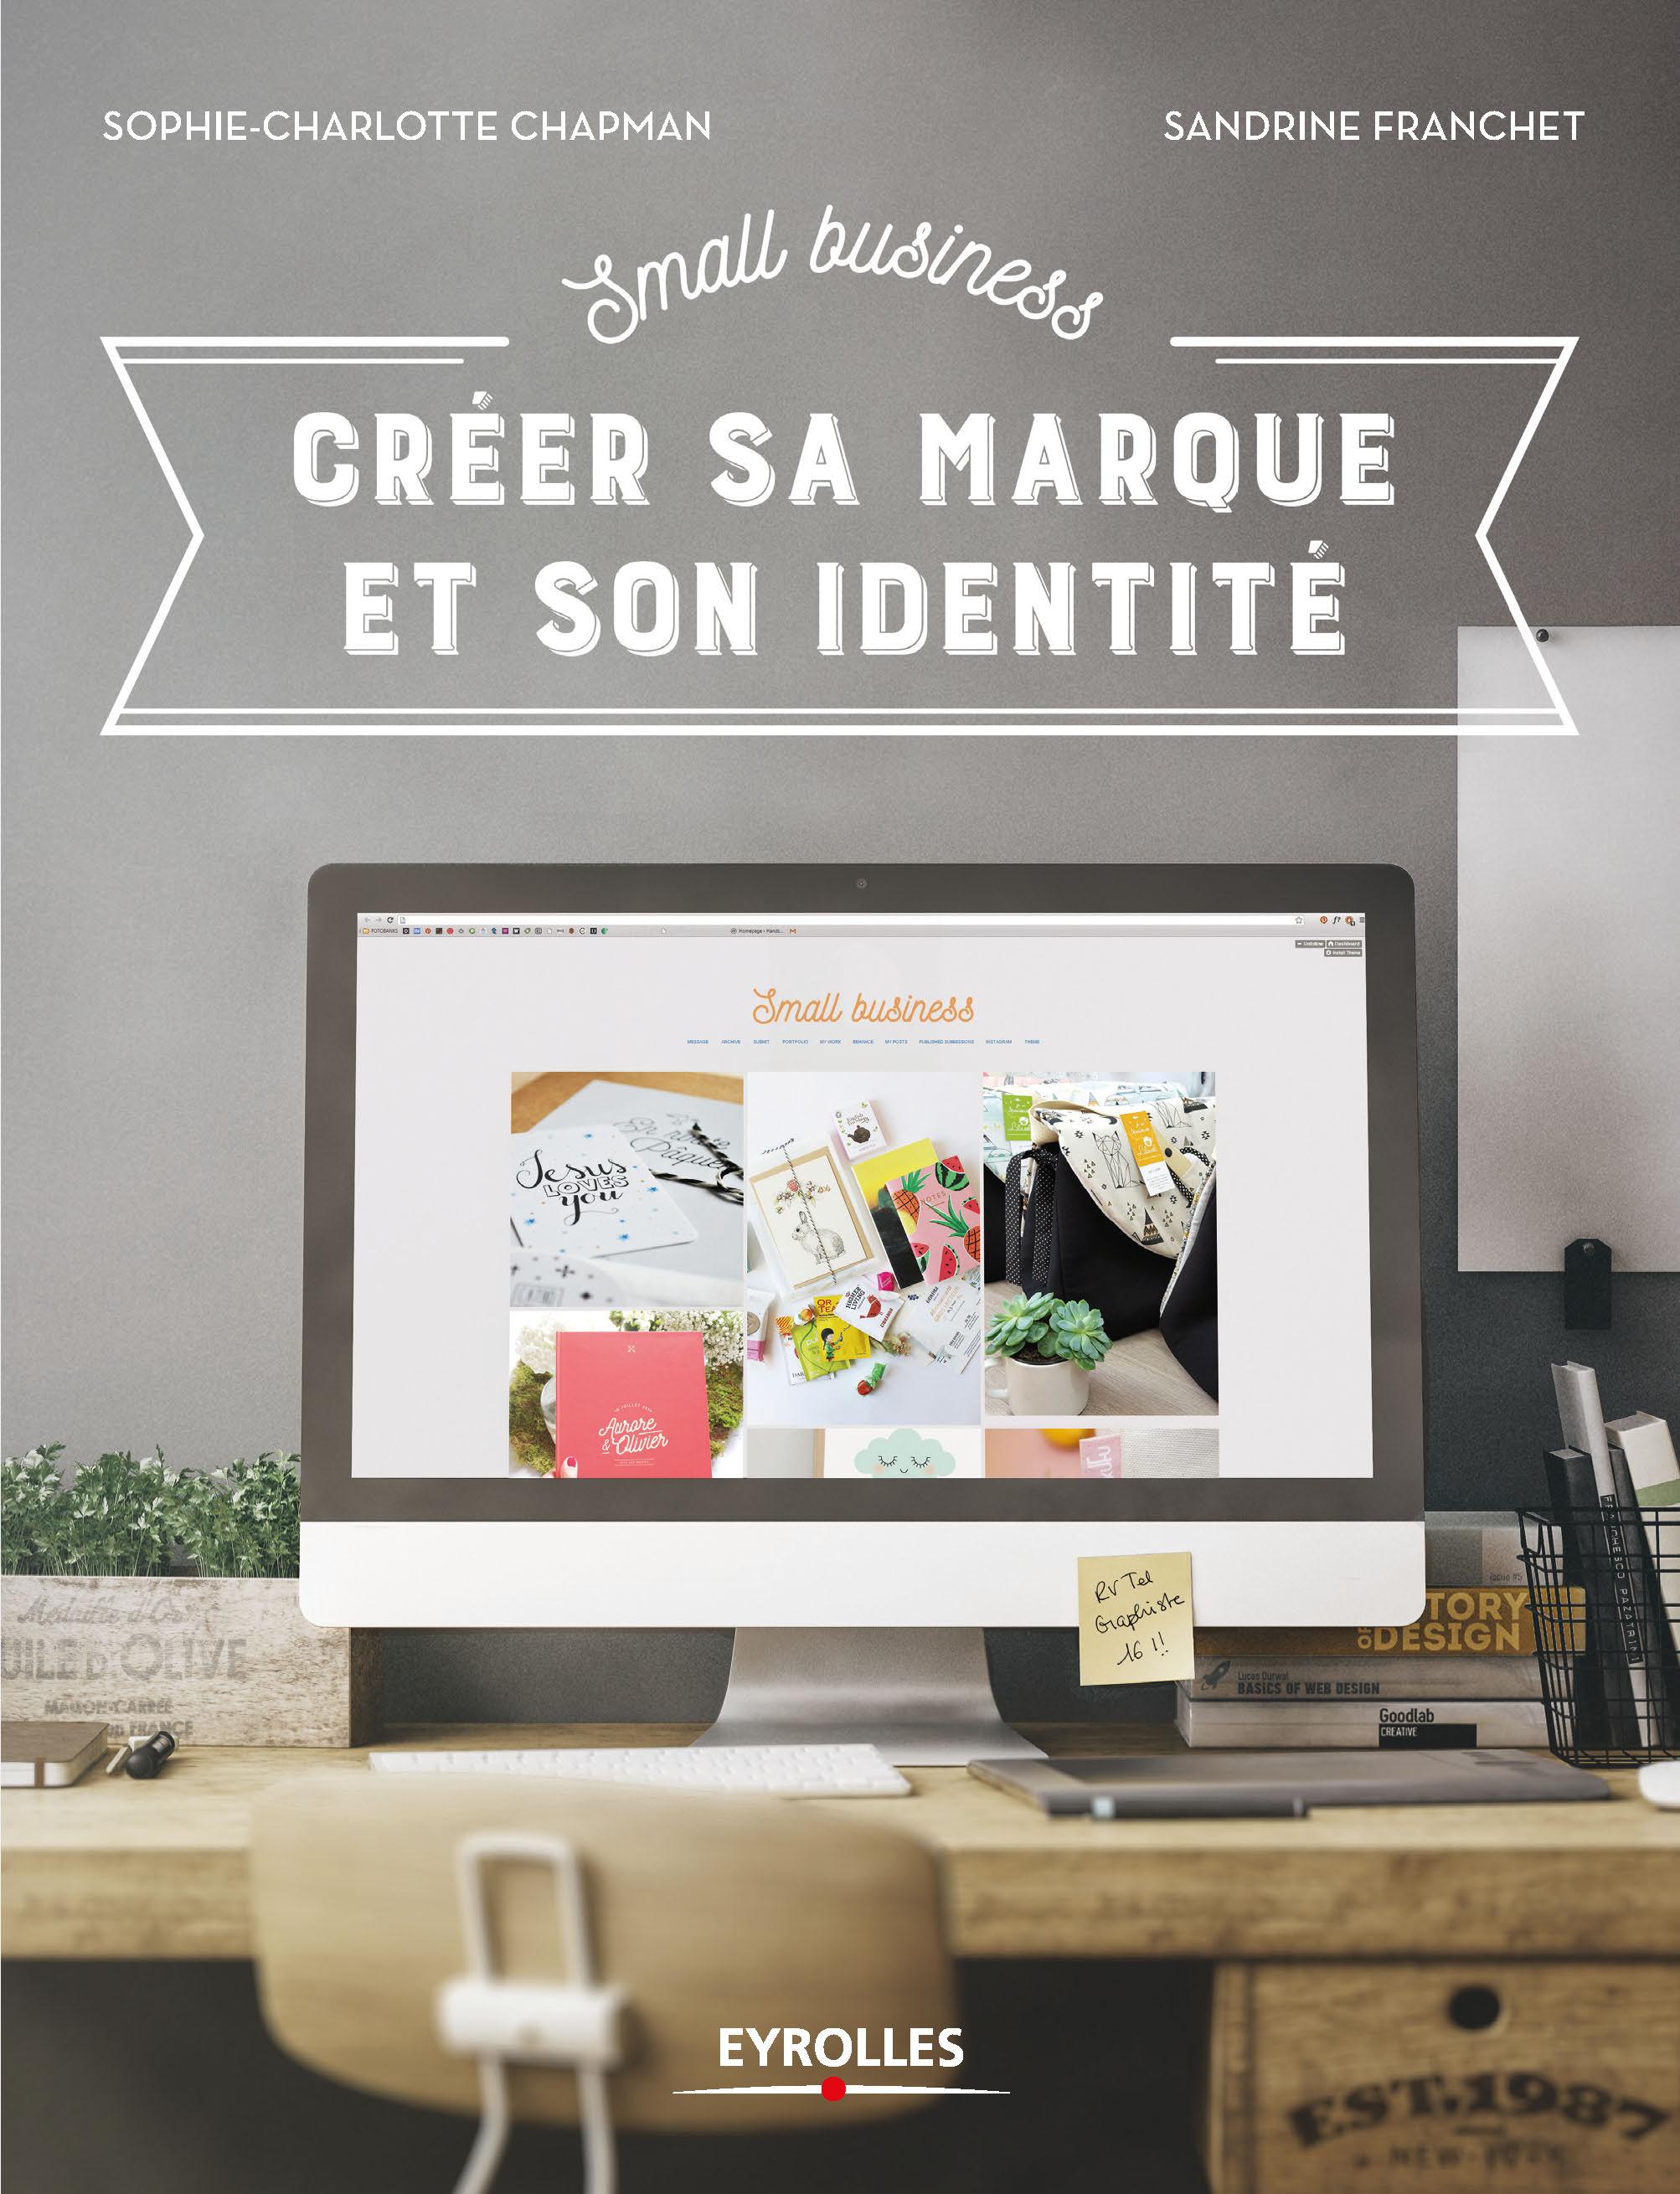 CreerSaMarque